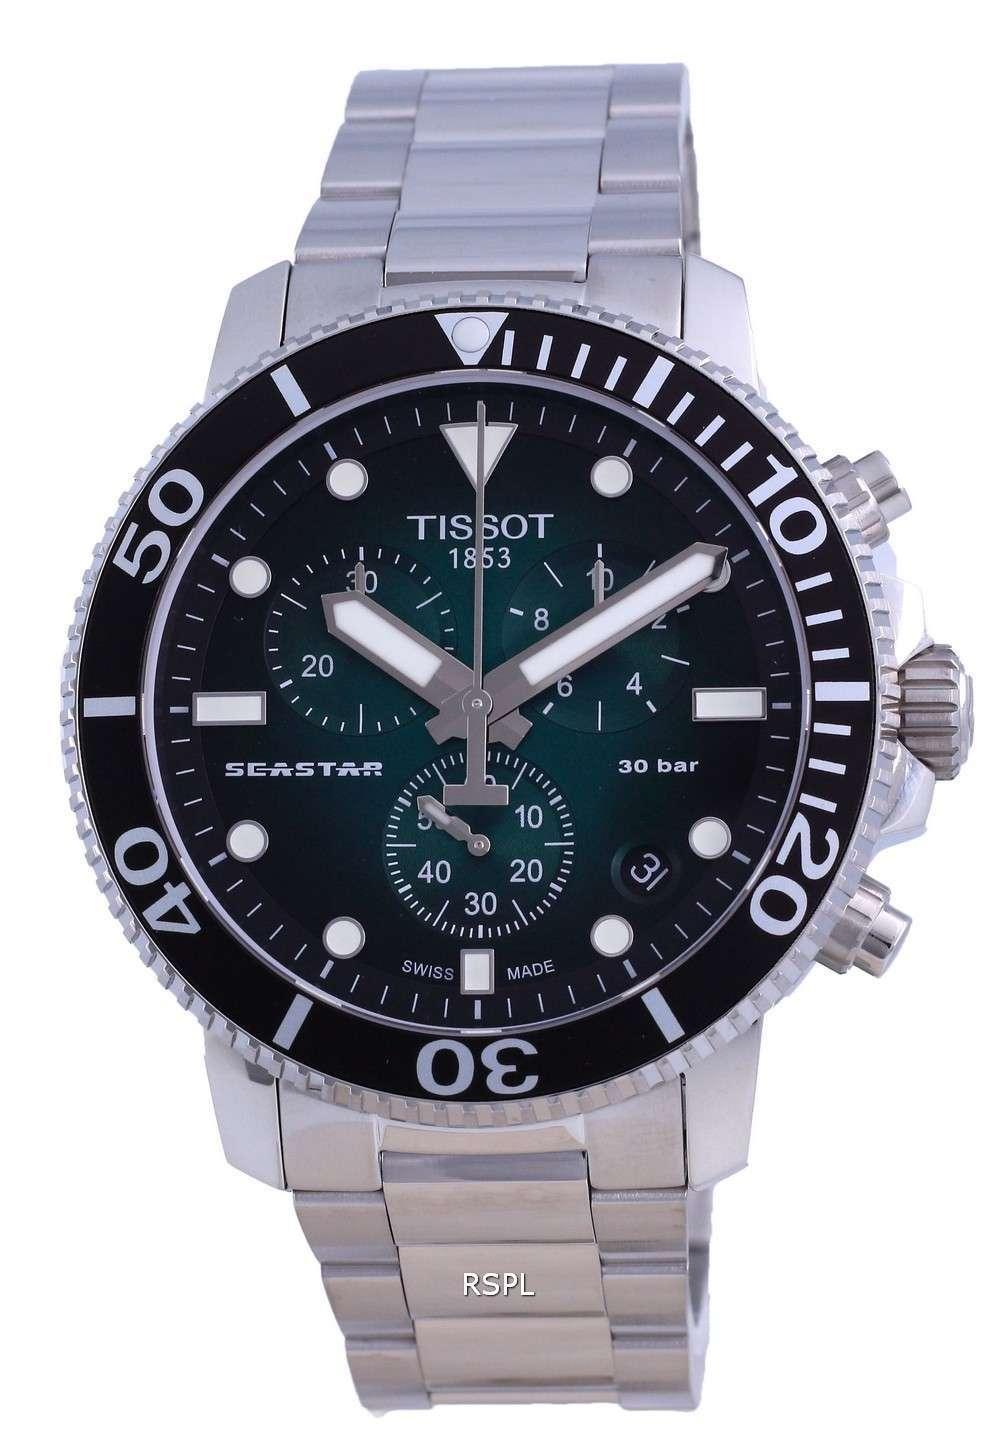 Tissot T-Sport Seaster 1000 Chronograph Diver&#39,s Quartz T120.417.11.091.01 T1204171109101 300M Reloj para hombre